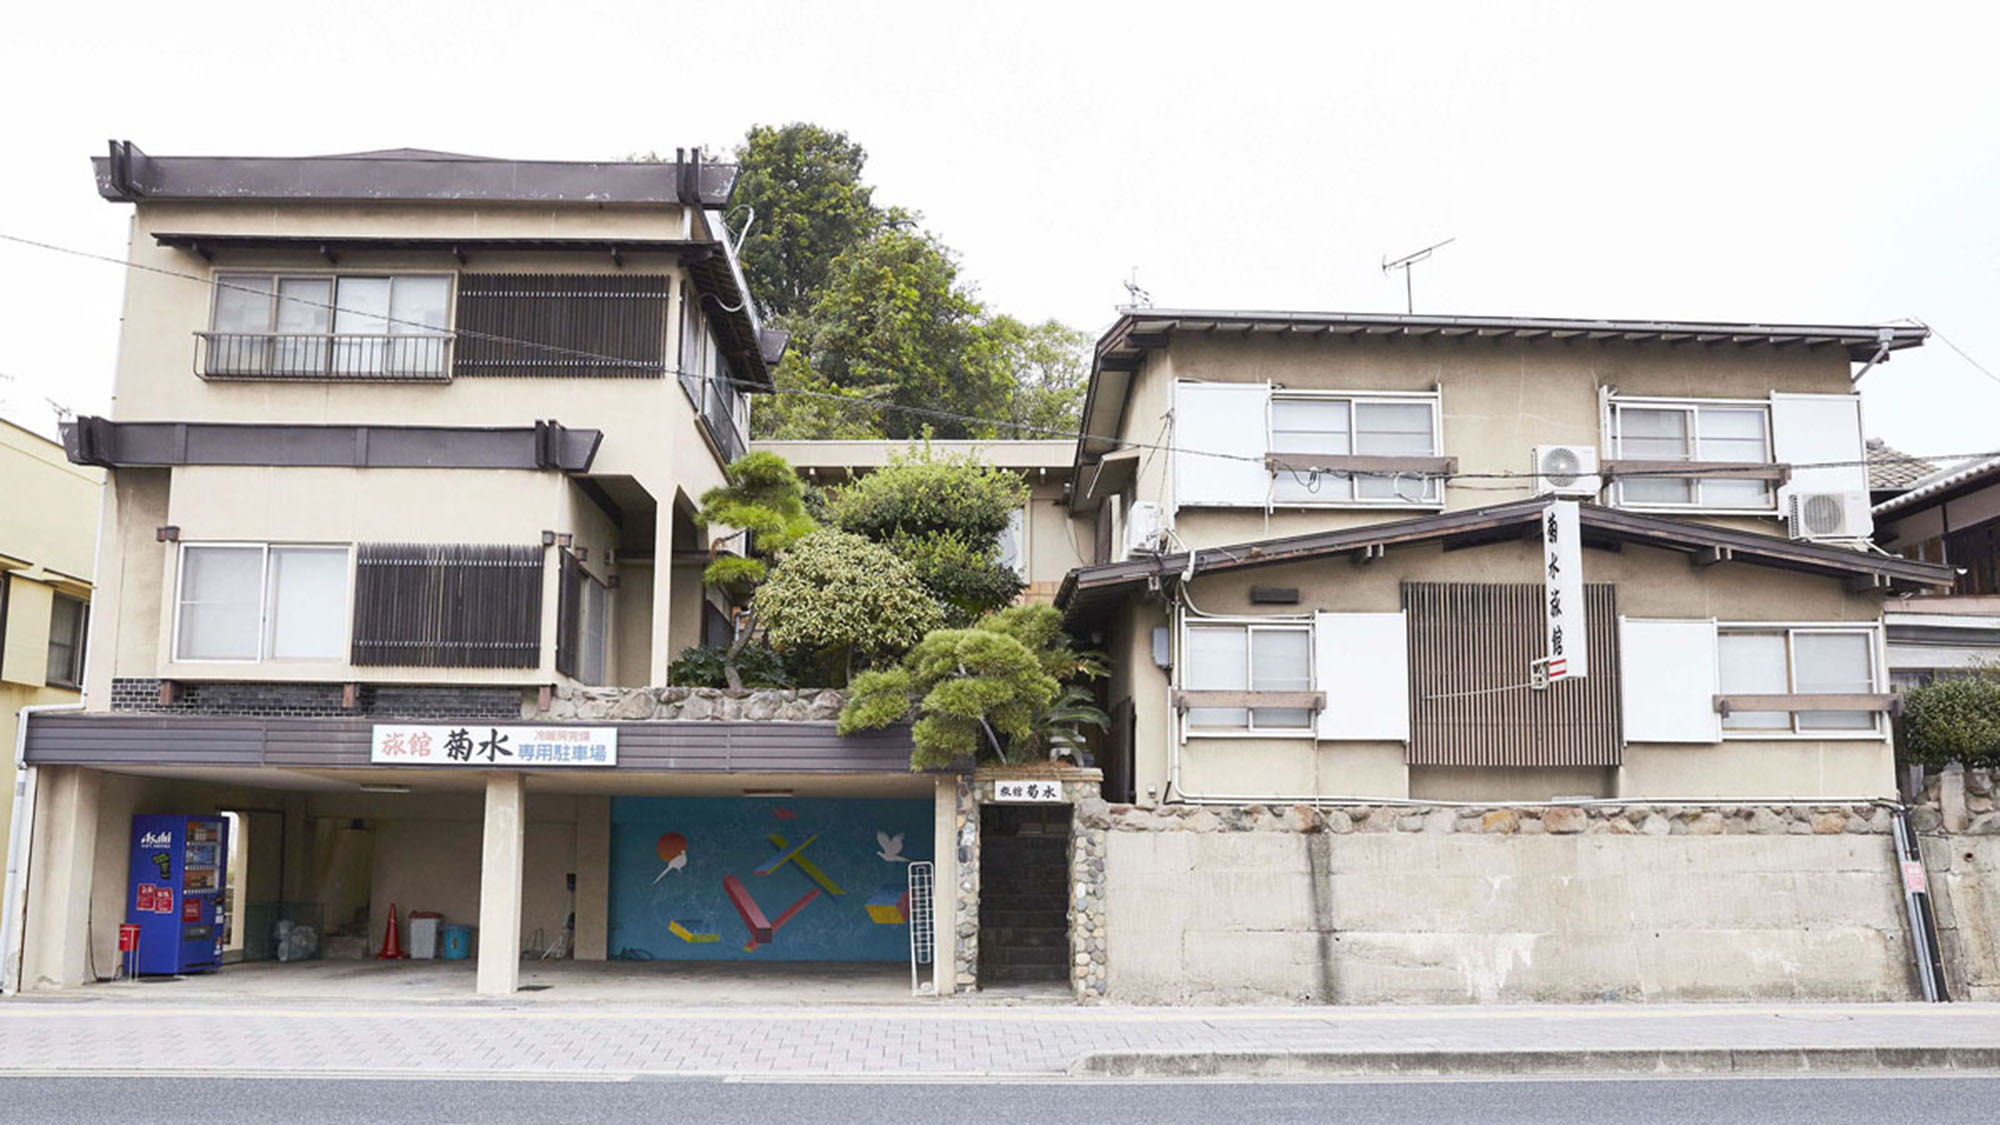 Guest House菊水旅館(KIKUSUI RYOKAN) image